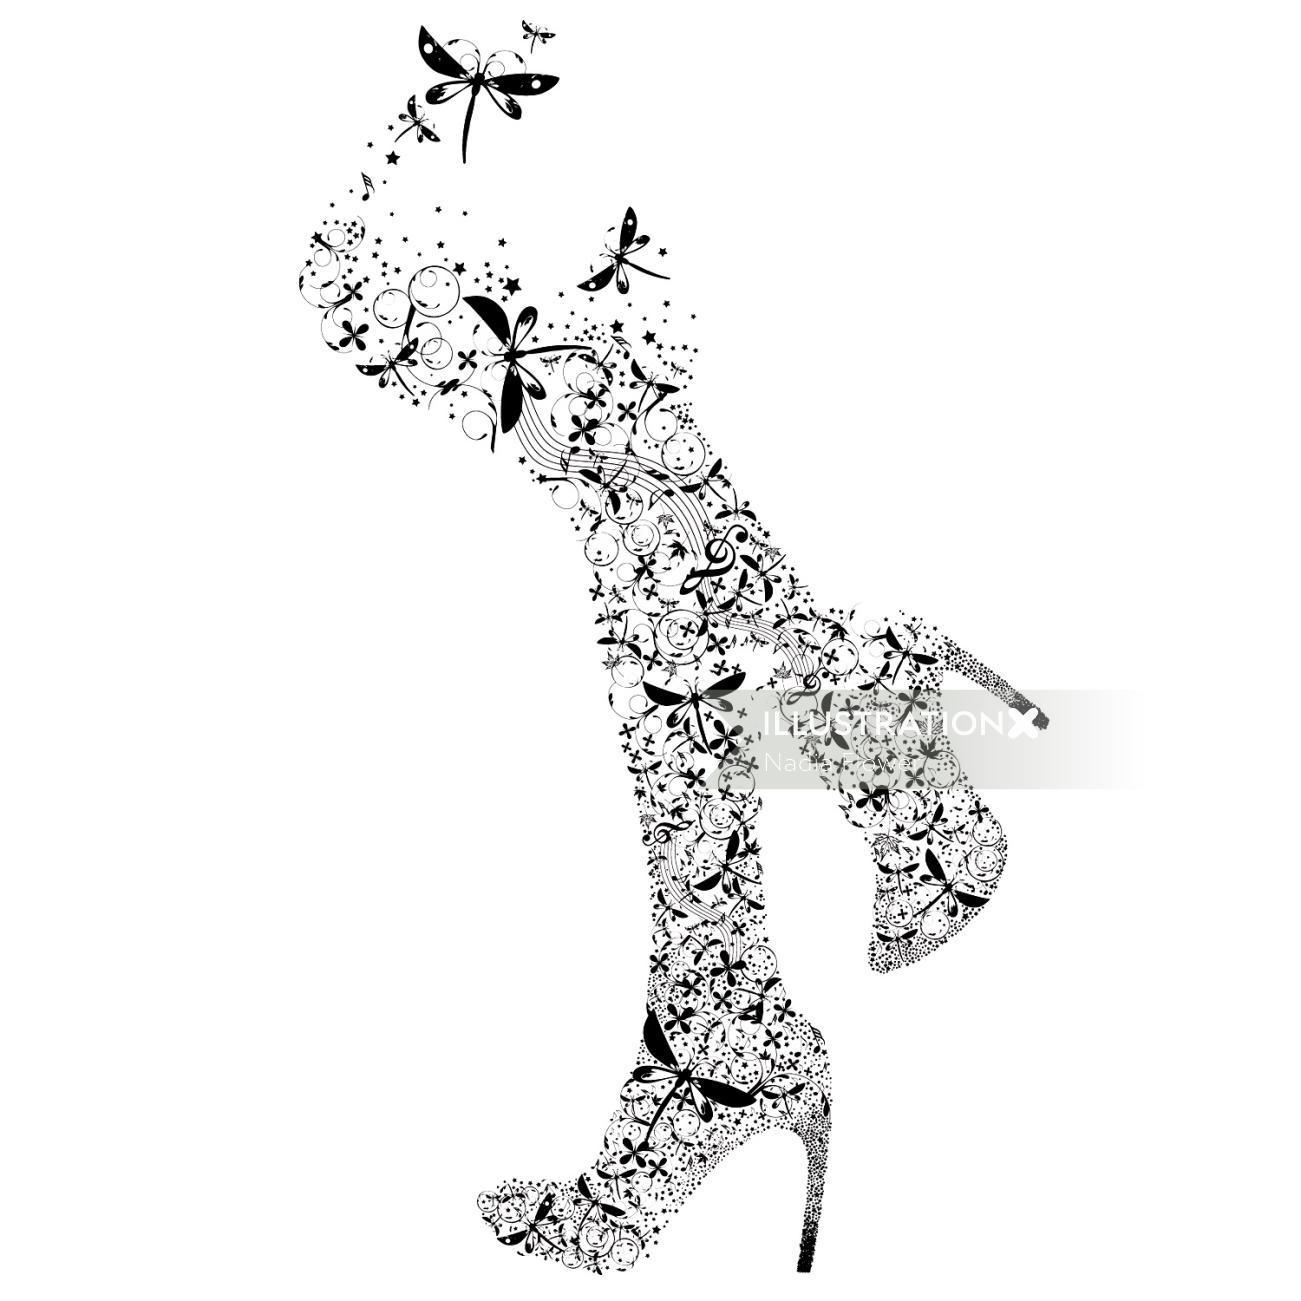 figurative illustration by Nadia Flower